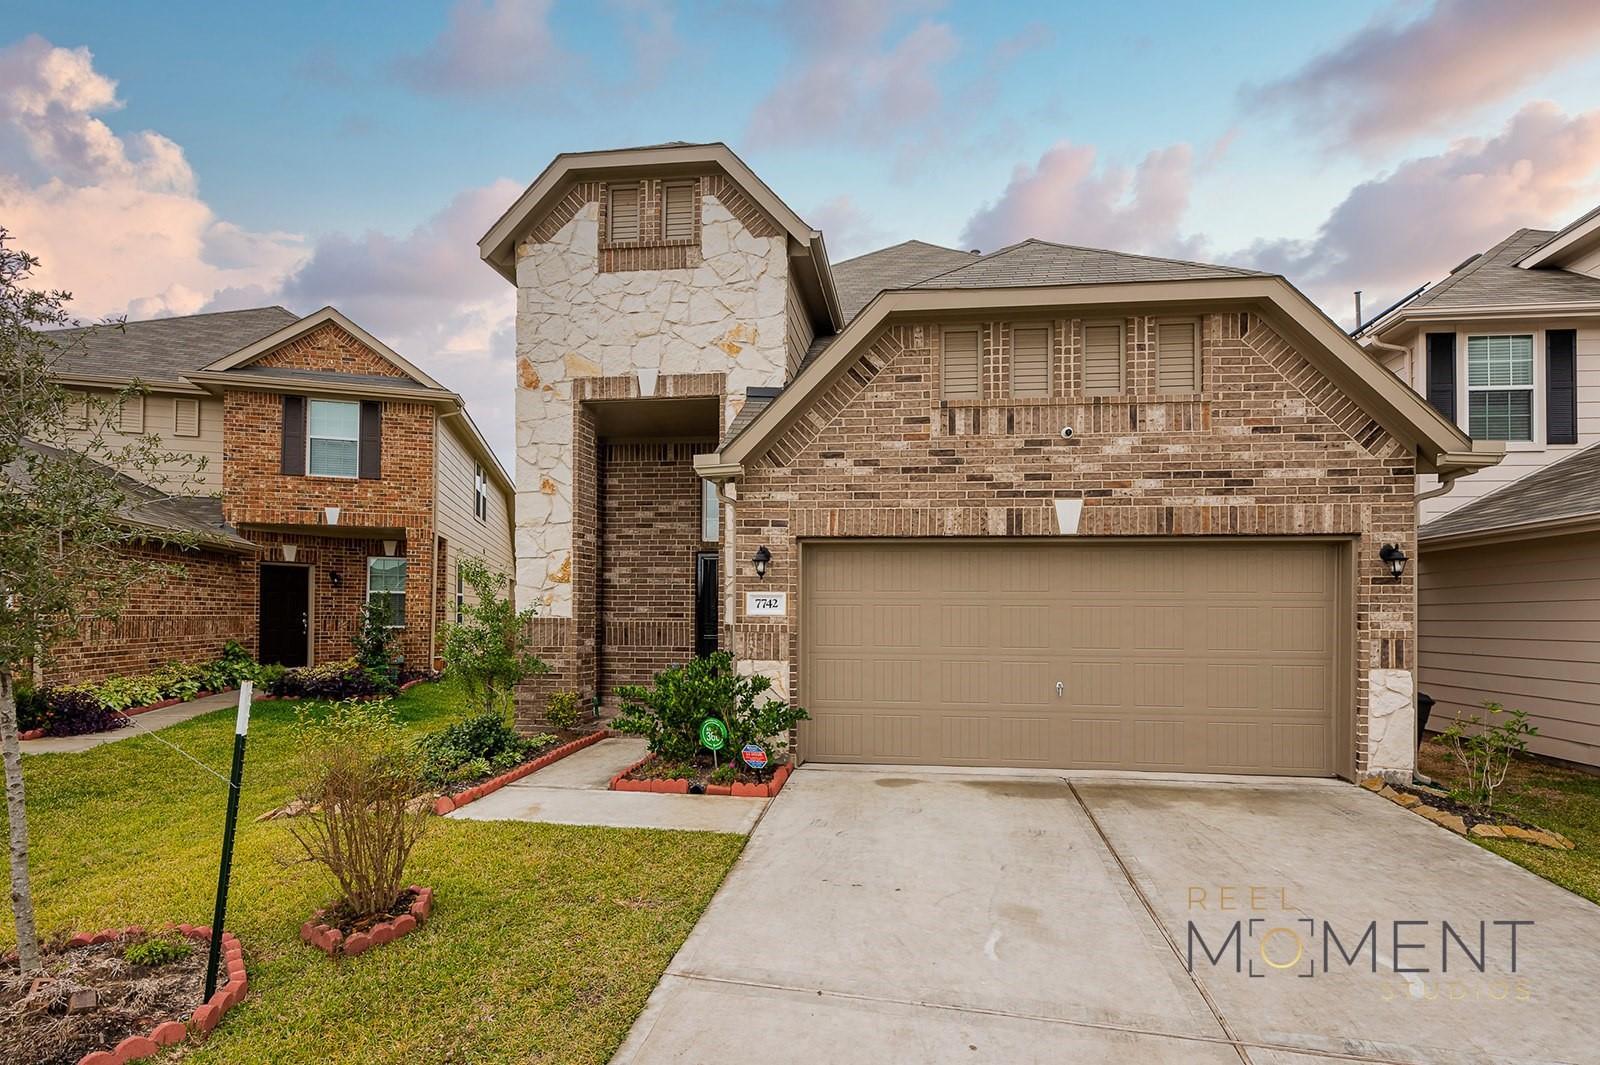 7742 Granite Terrace Lane Property Photo - Houston, TX real estate listing